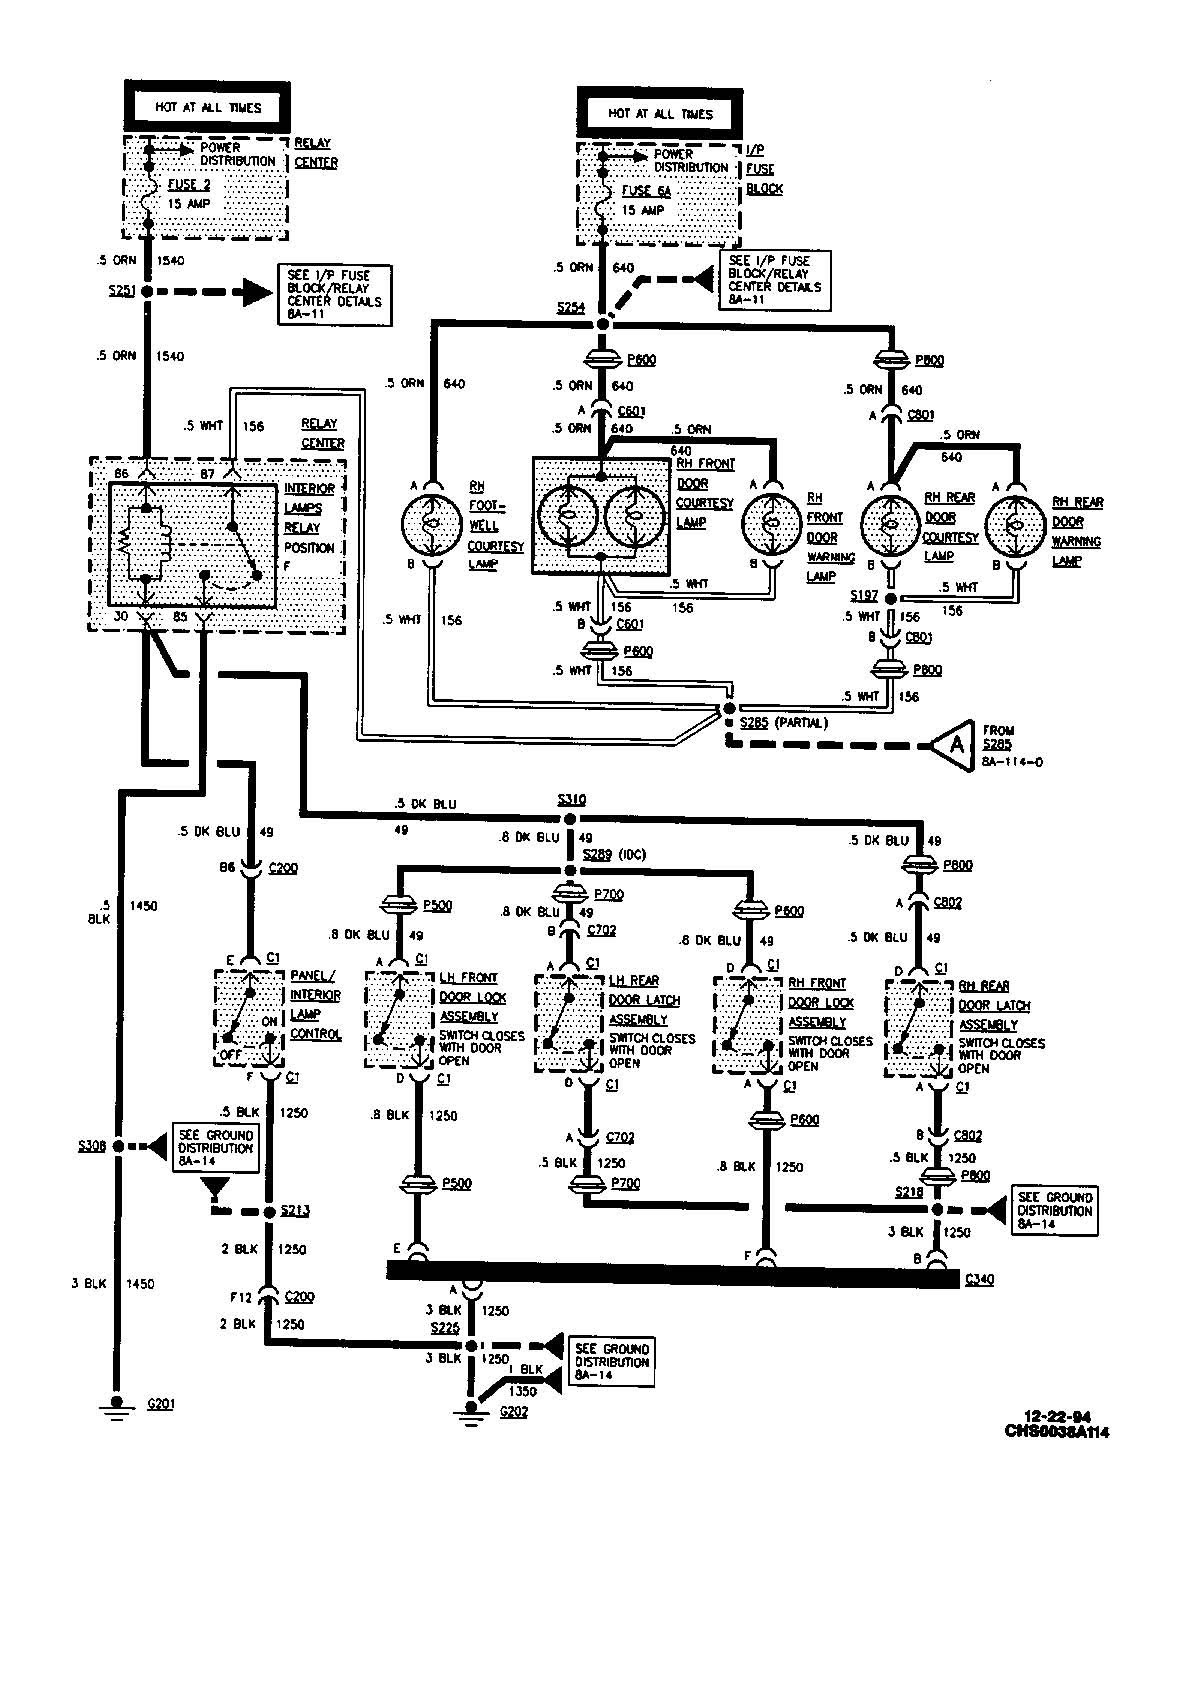 Diagram Of 1997 Series 2 3800 Engine